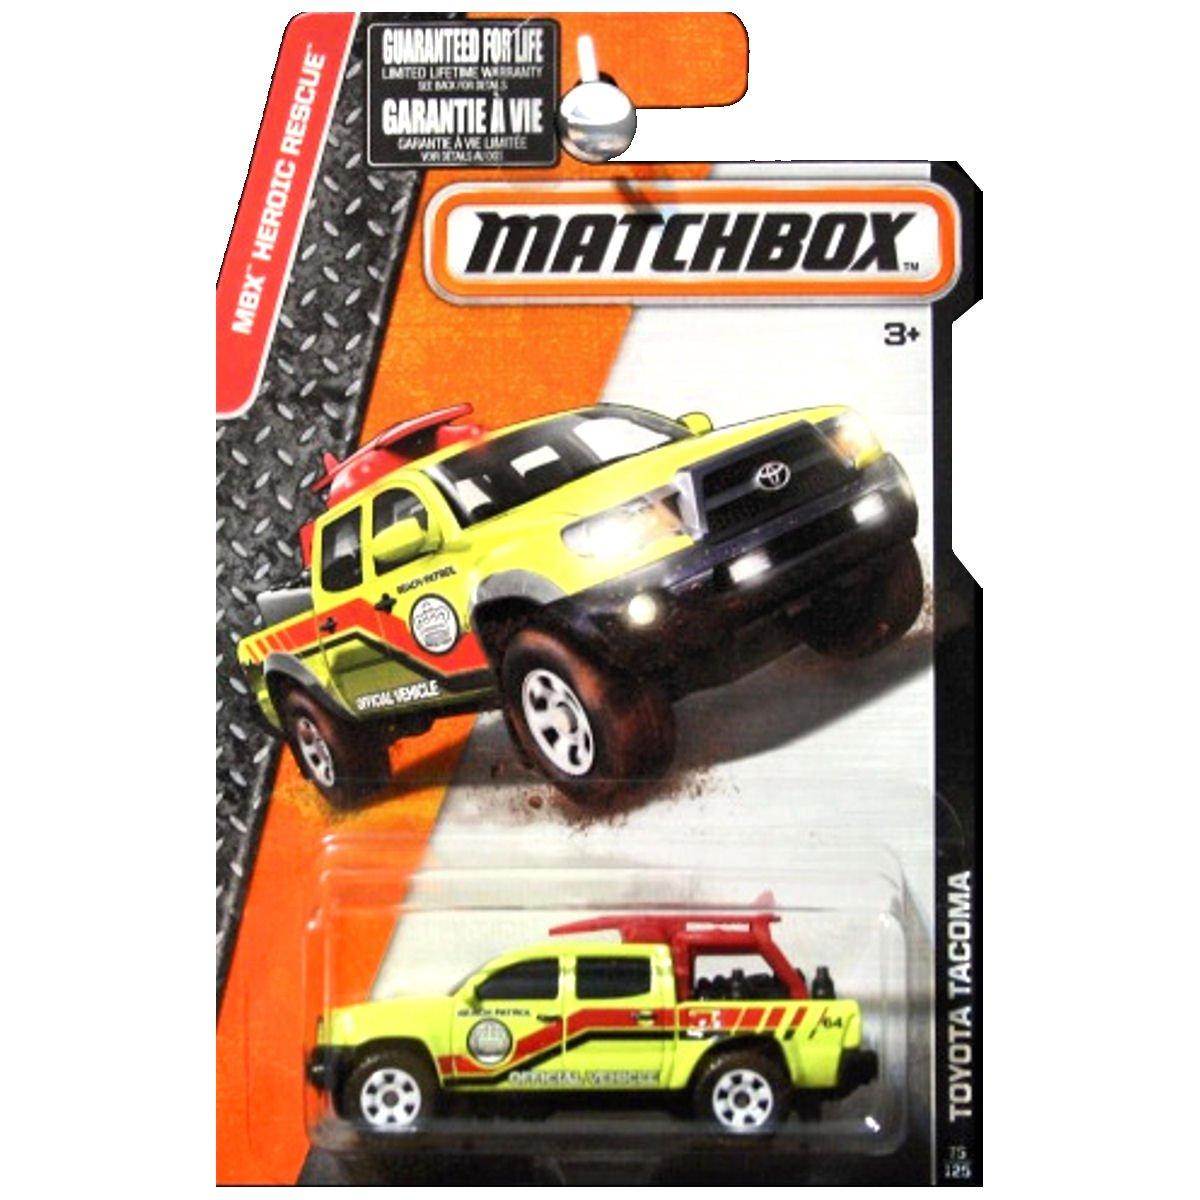 Matchbox 2016 MBX Heroic Rescue Toyota Tacoma Lifeguard Truck Beach Rescue Yellow Mattel